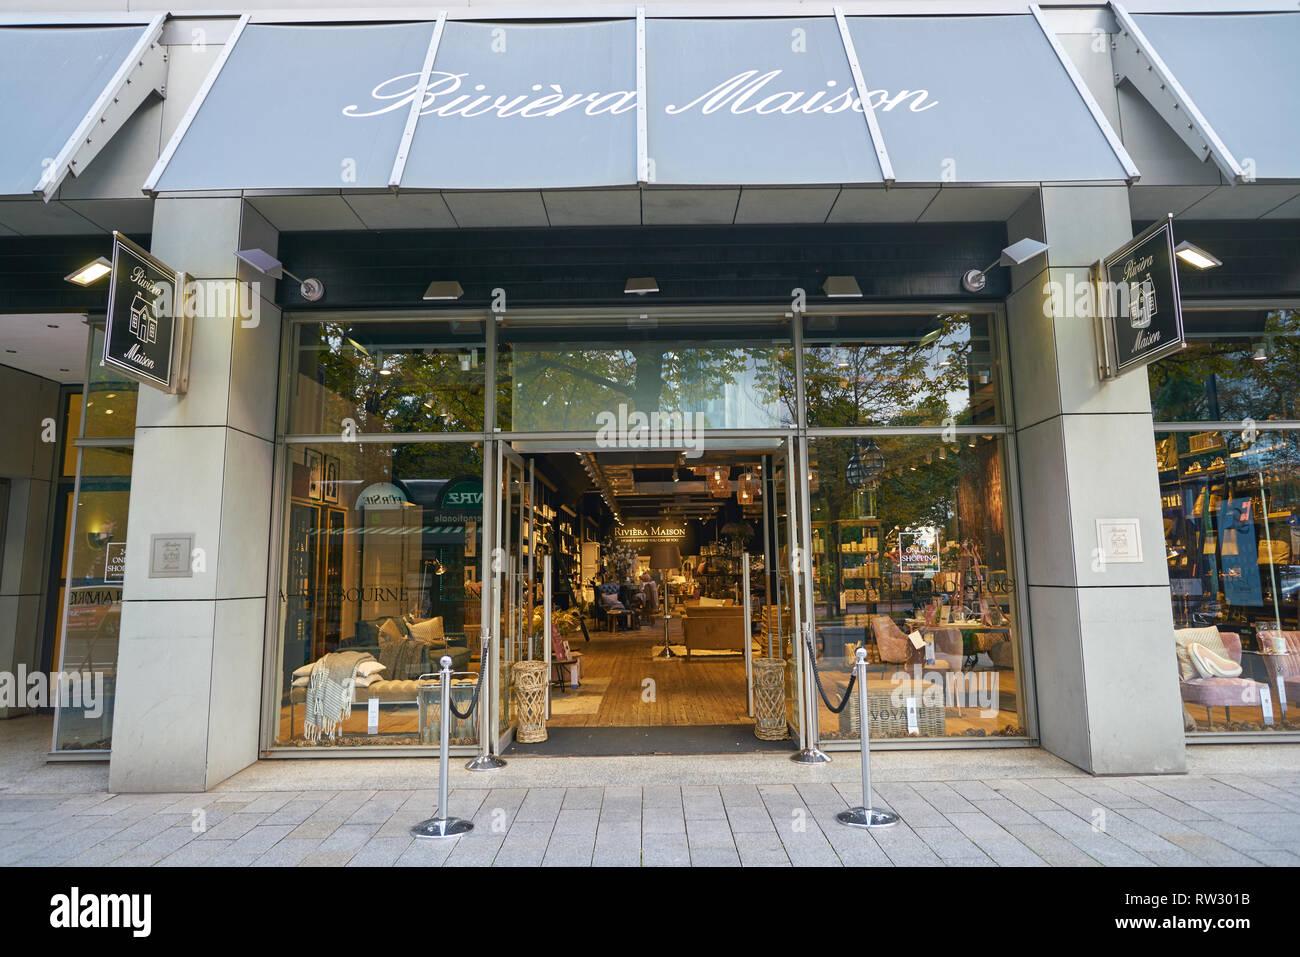 Riviera Maison Stockfotos & Riviera Maison Bilder - Alamy